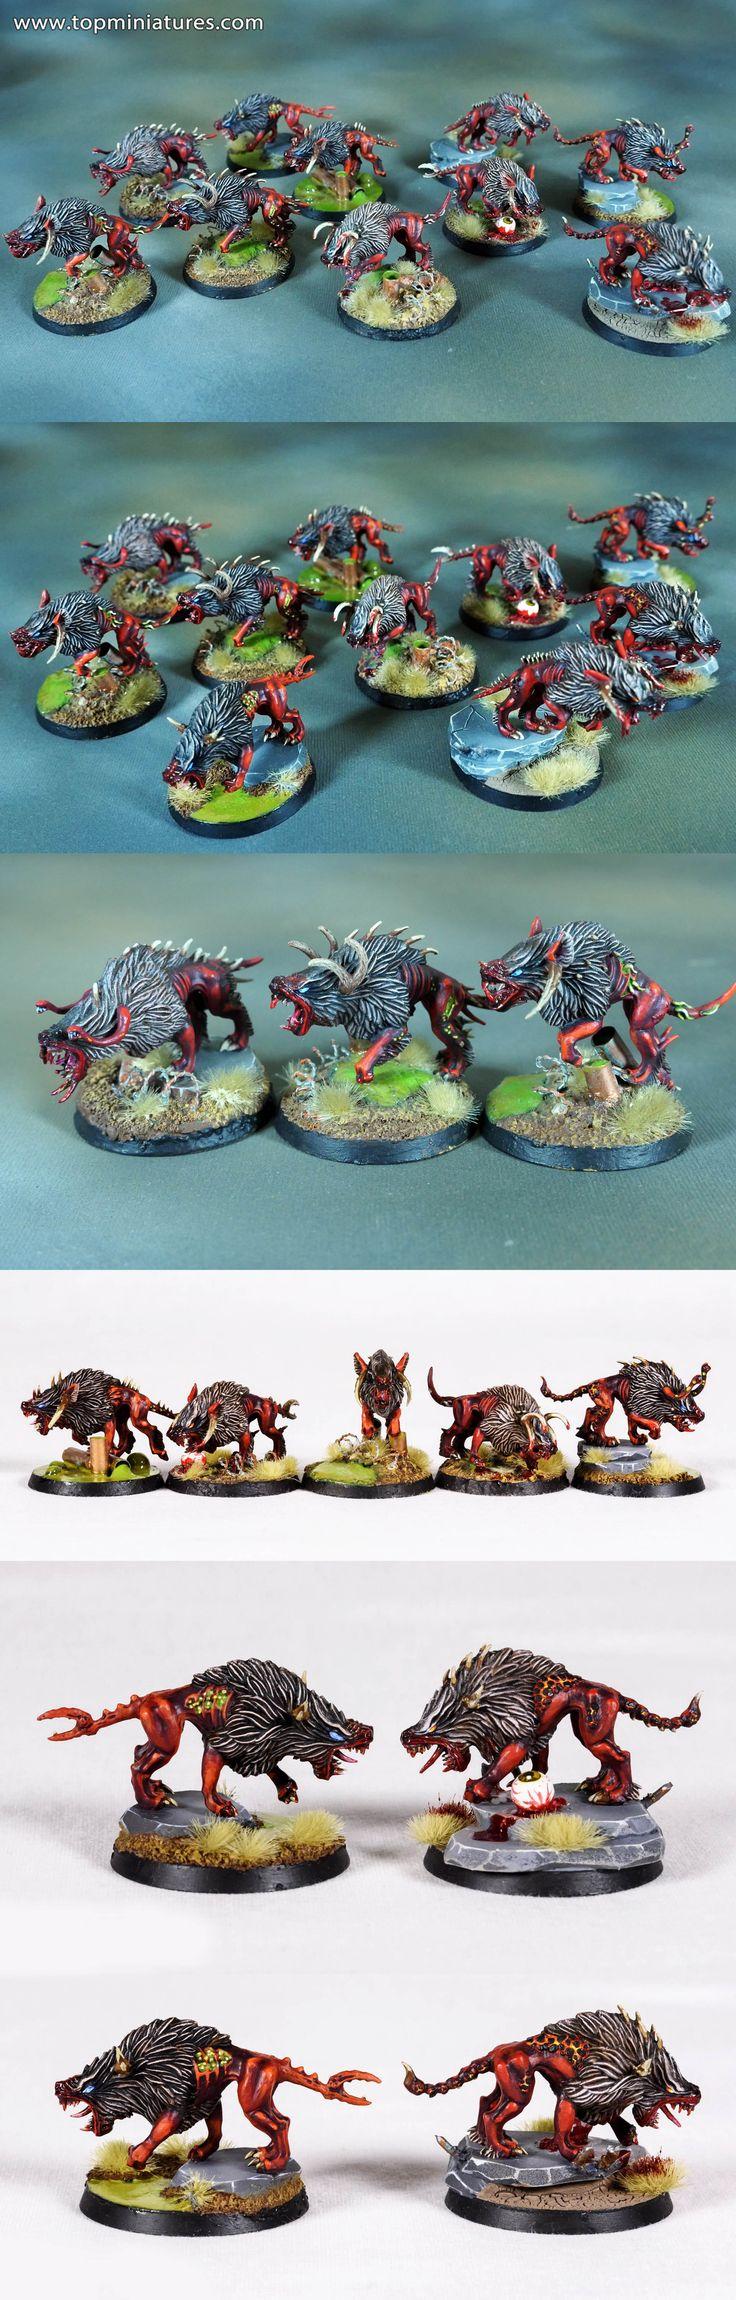 Warhammer fantasy & age of sigmar chaos warhounds / flesh hounds of khorne